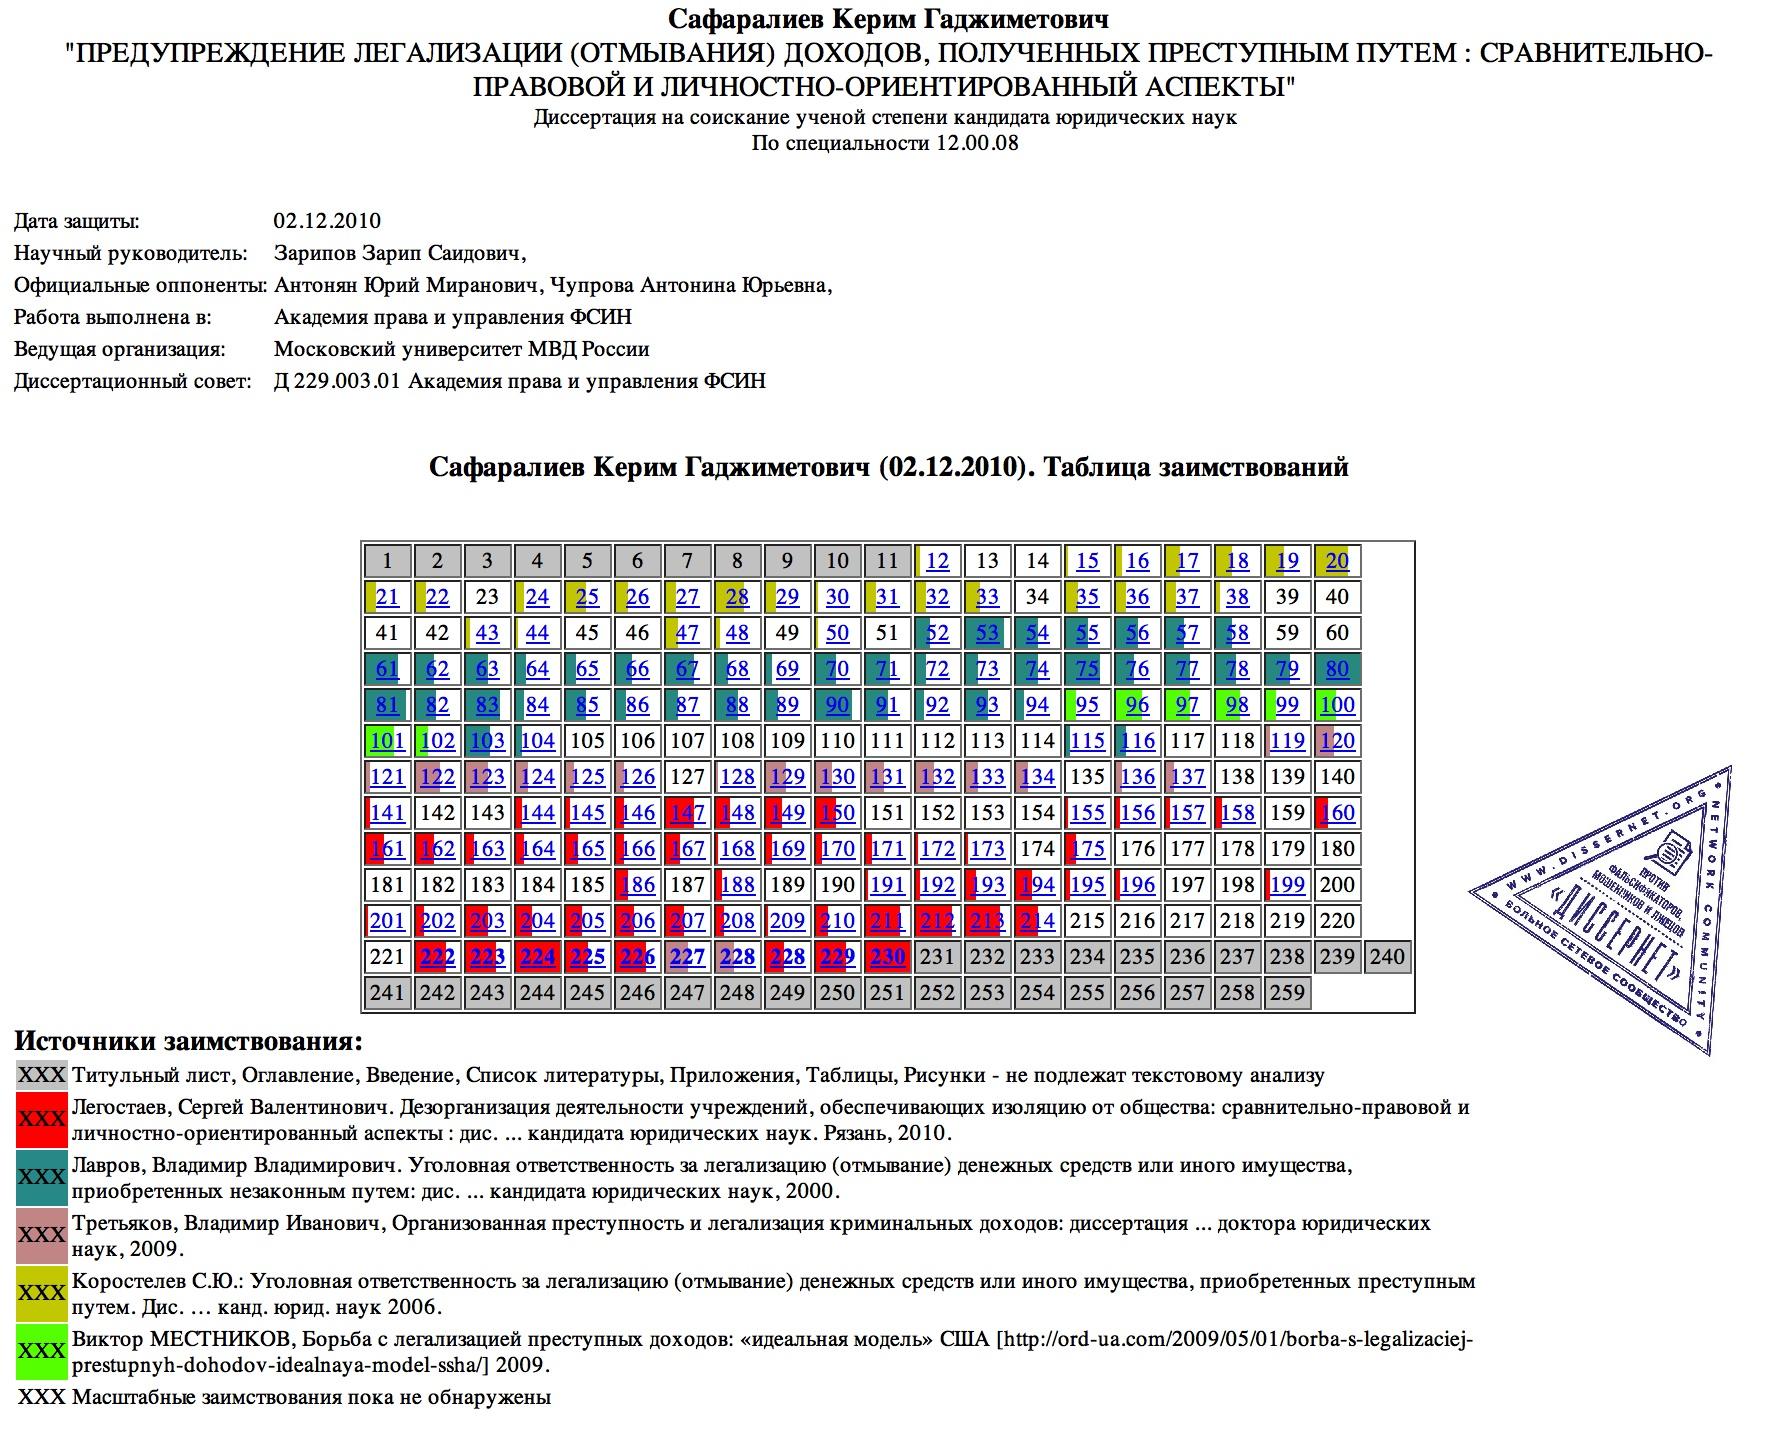 safaraliev-table